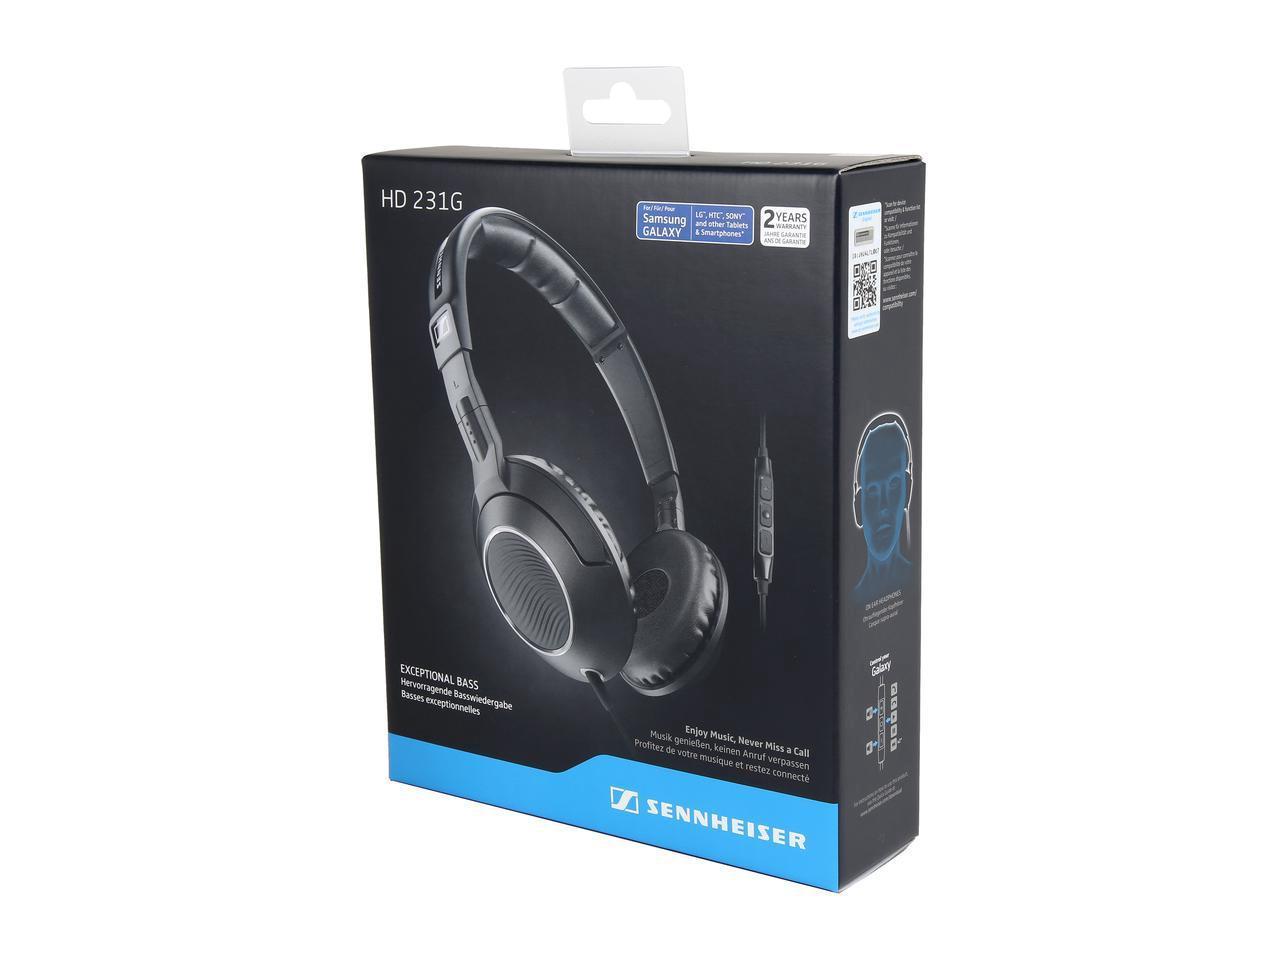 Sennheiser HD 231G On Ear Headphones w/ Inline Microphone/Remote (Black) $23.95 + Free Shipping via Newegg